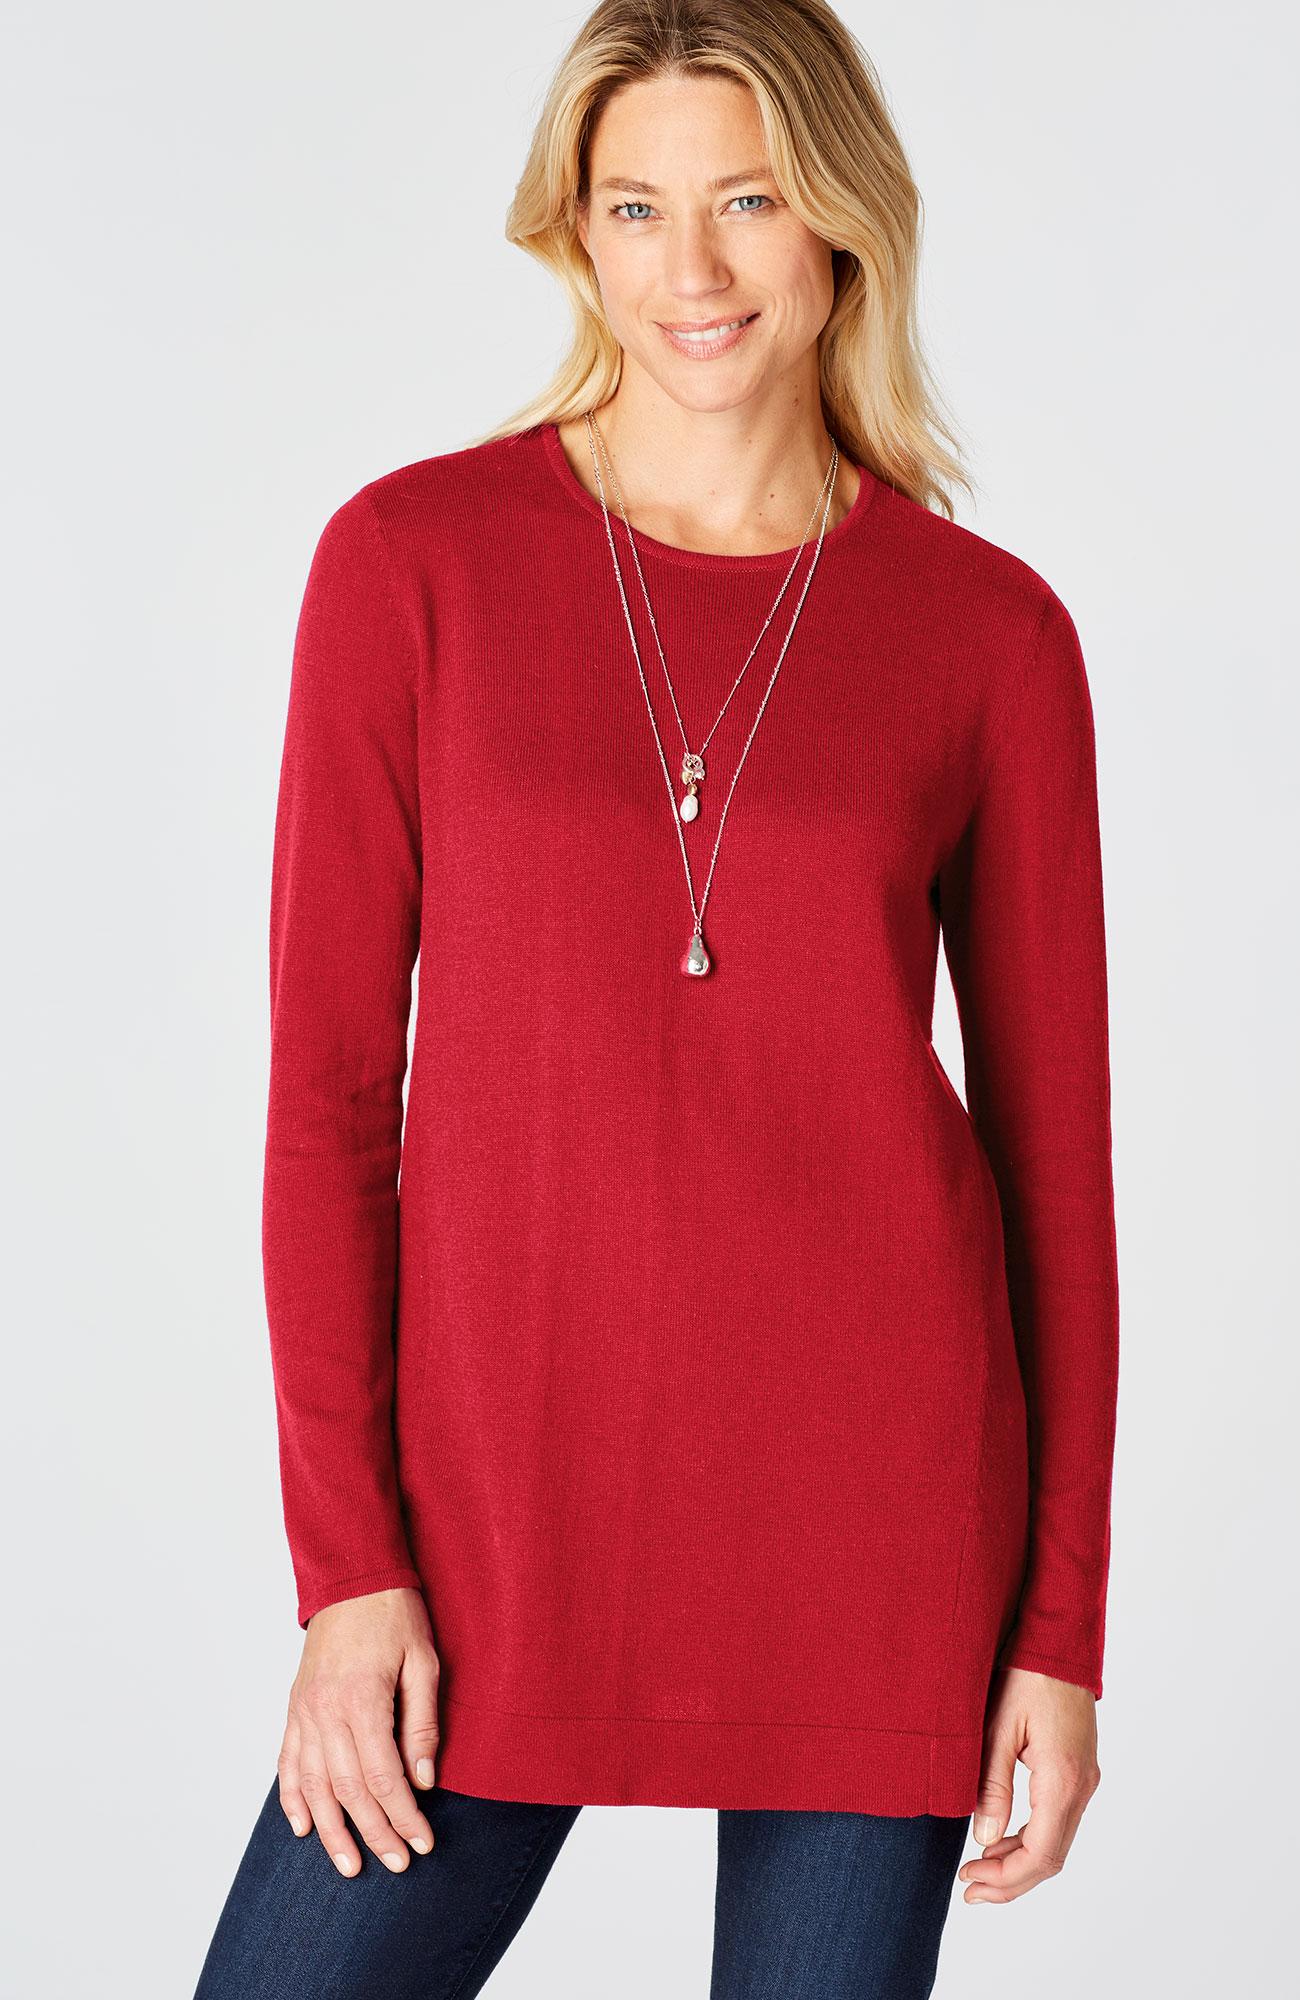 Sophia A-line pullover